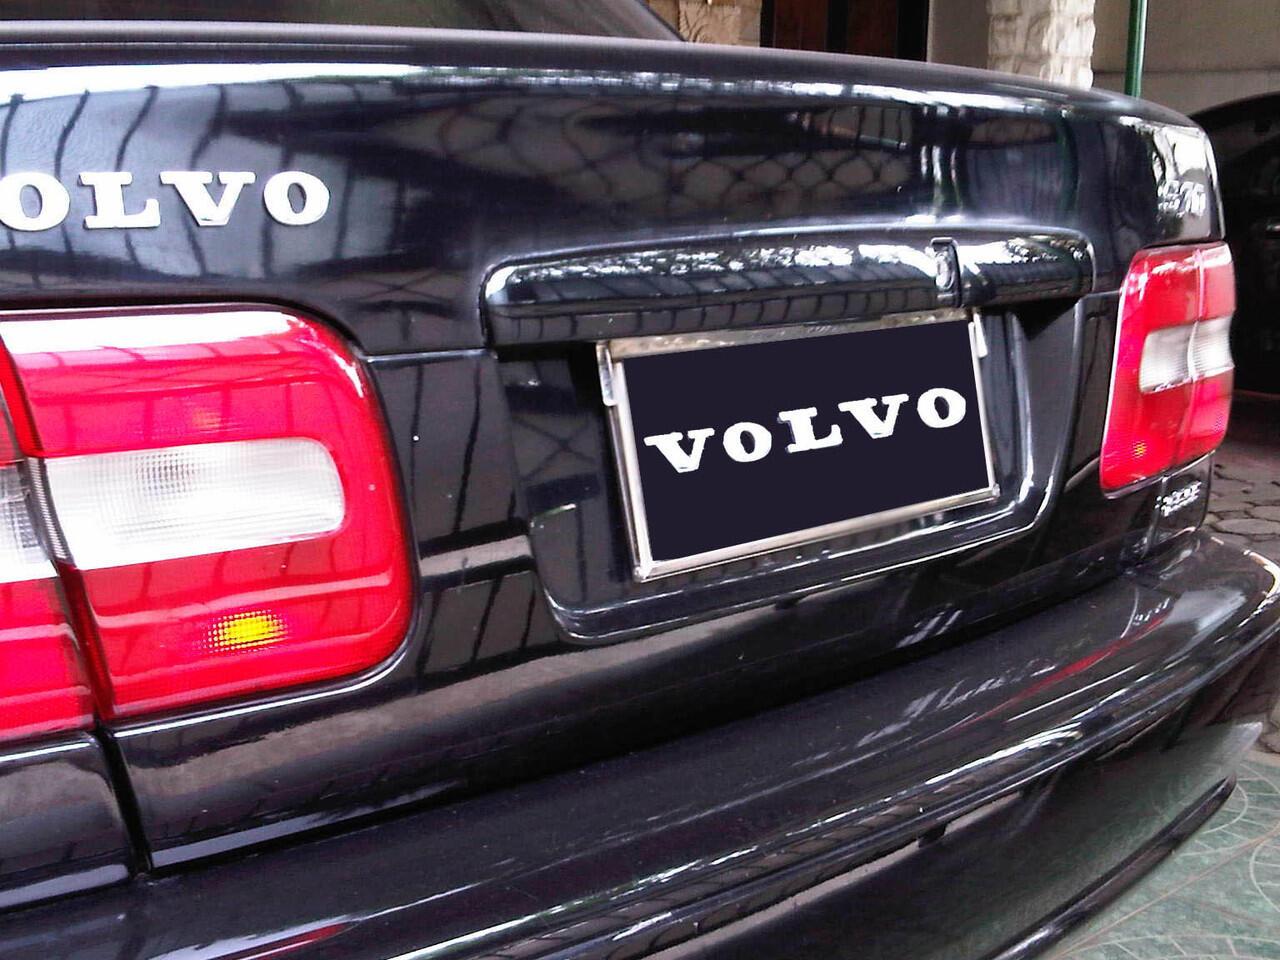 Volvo S70 M/T Tahun 2000 Hitam Solid